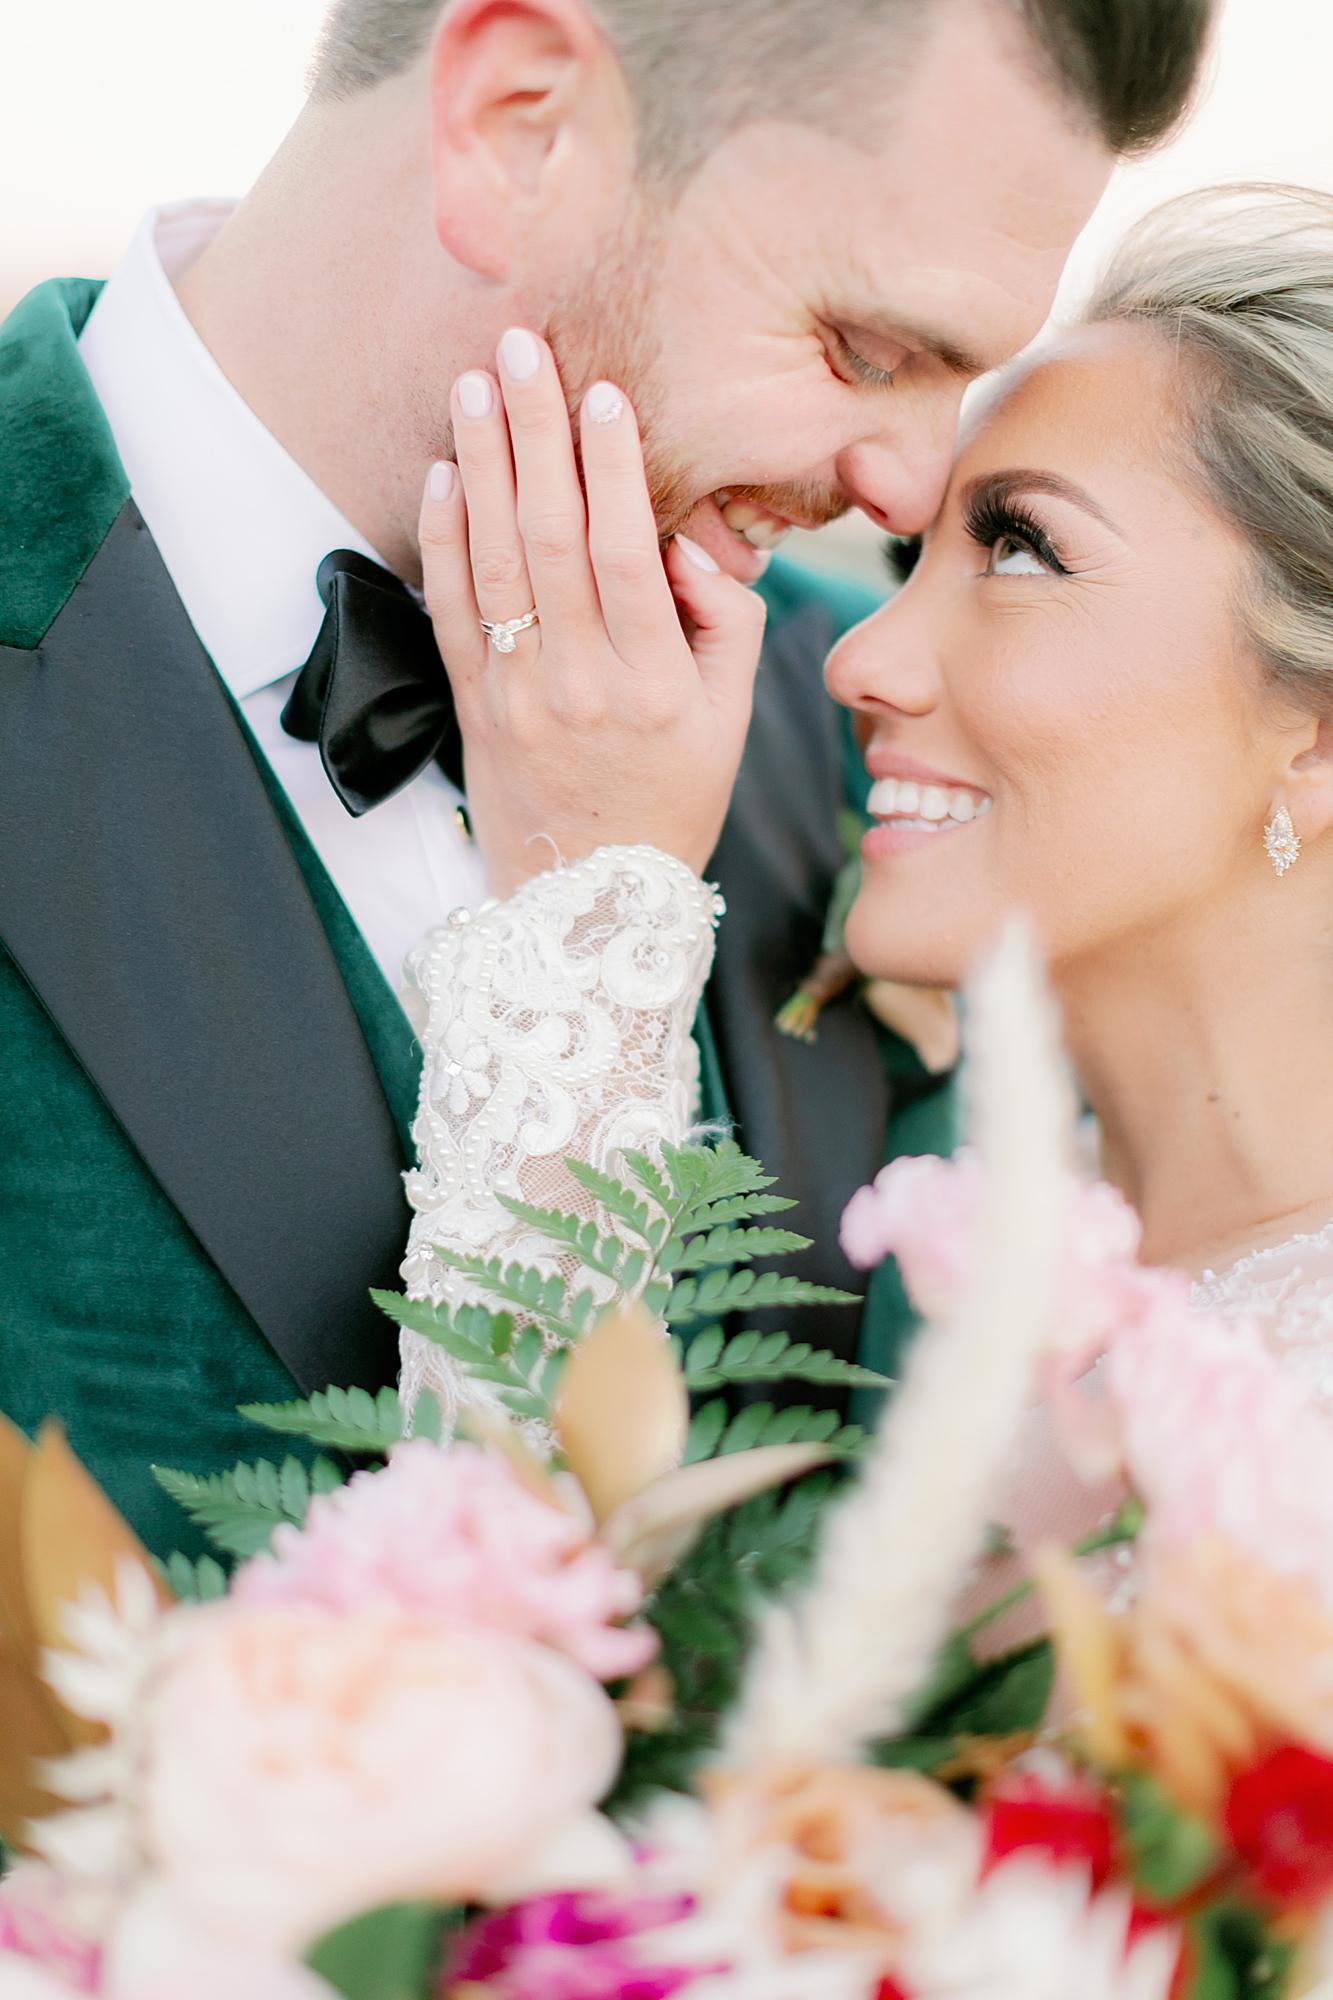 Bonnet Island Estate Film Wedding Photography by Magdalena Studios 0061